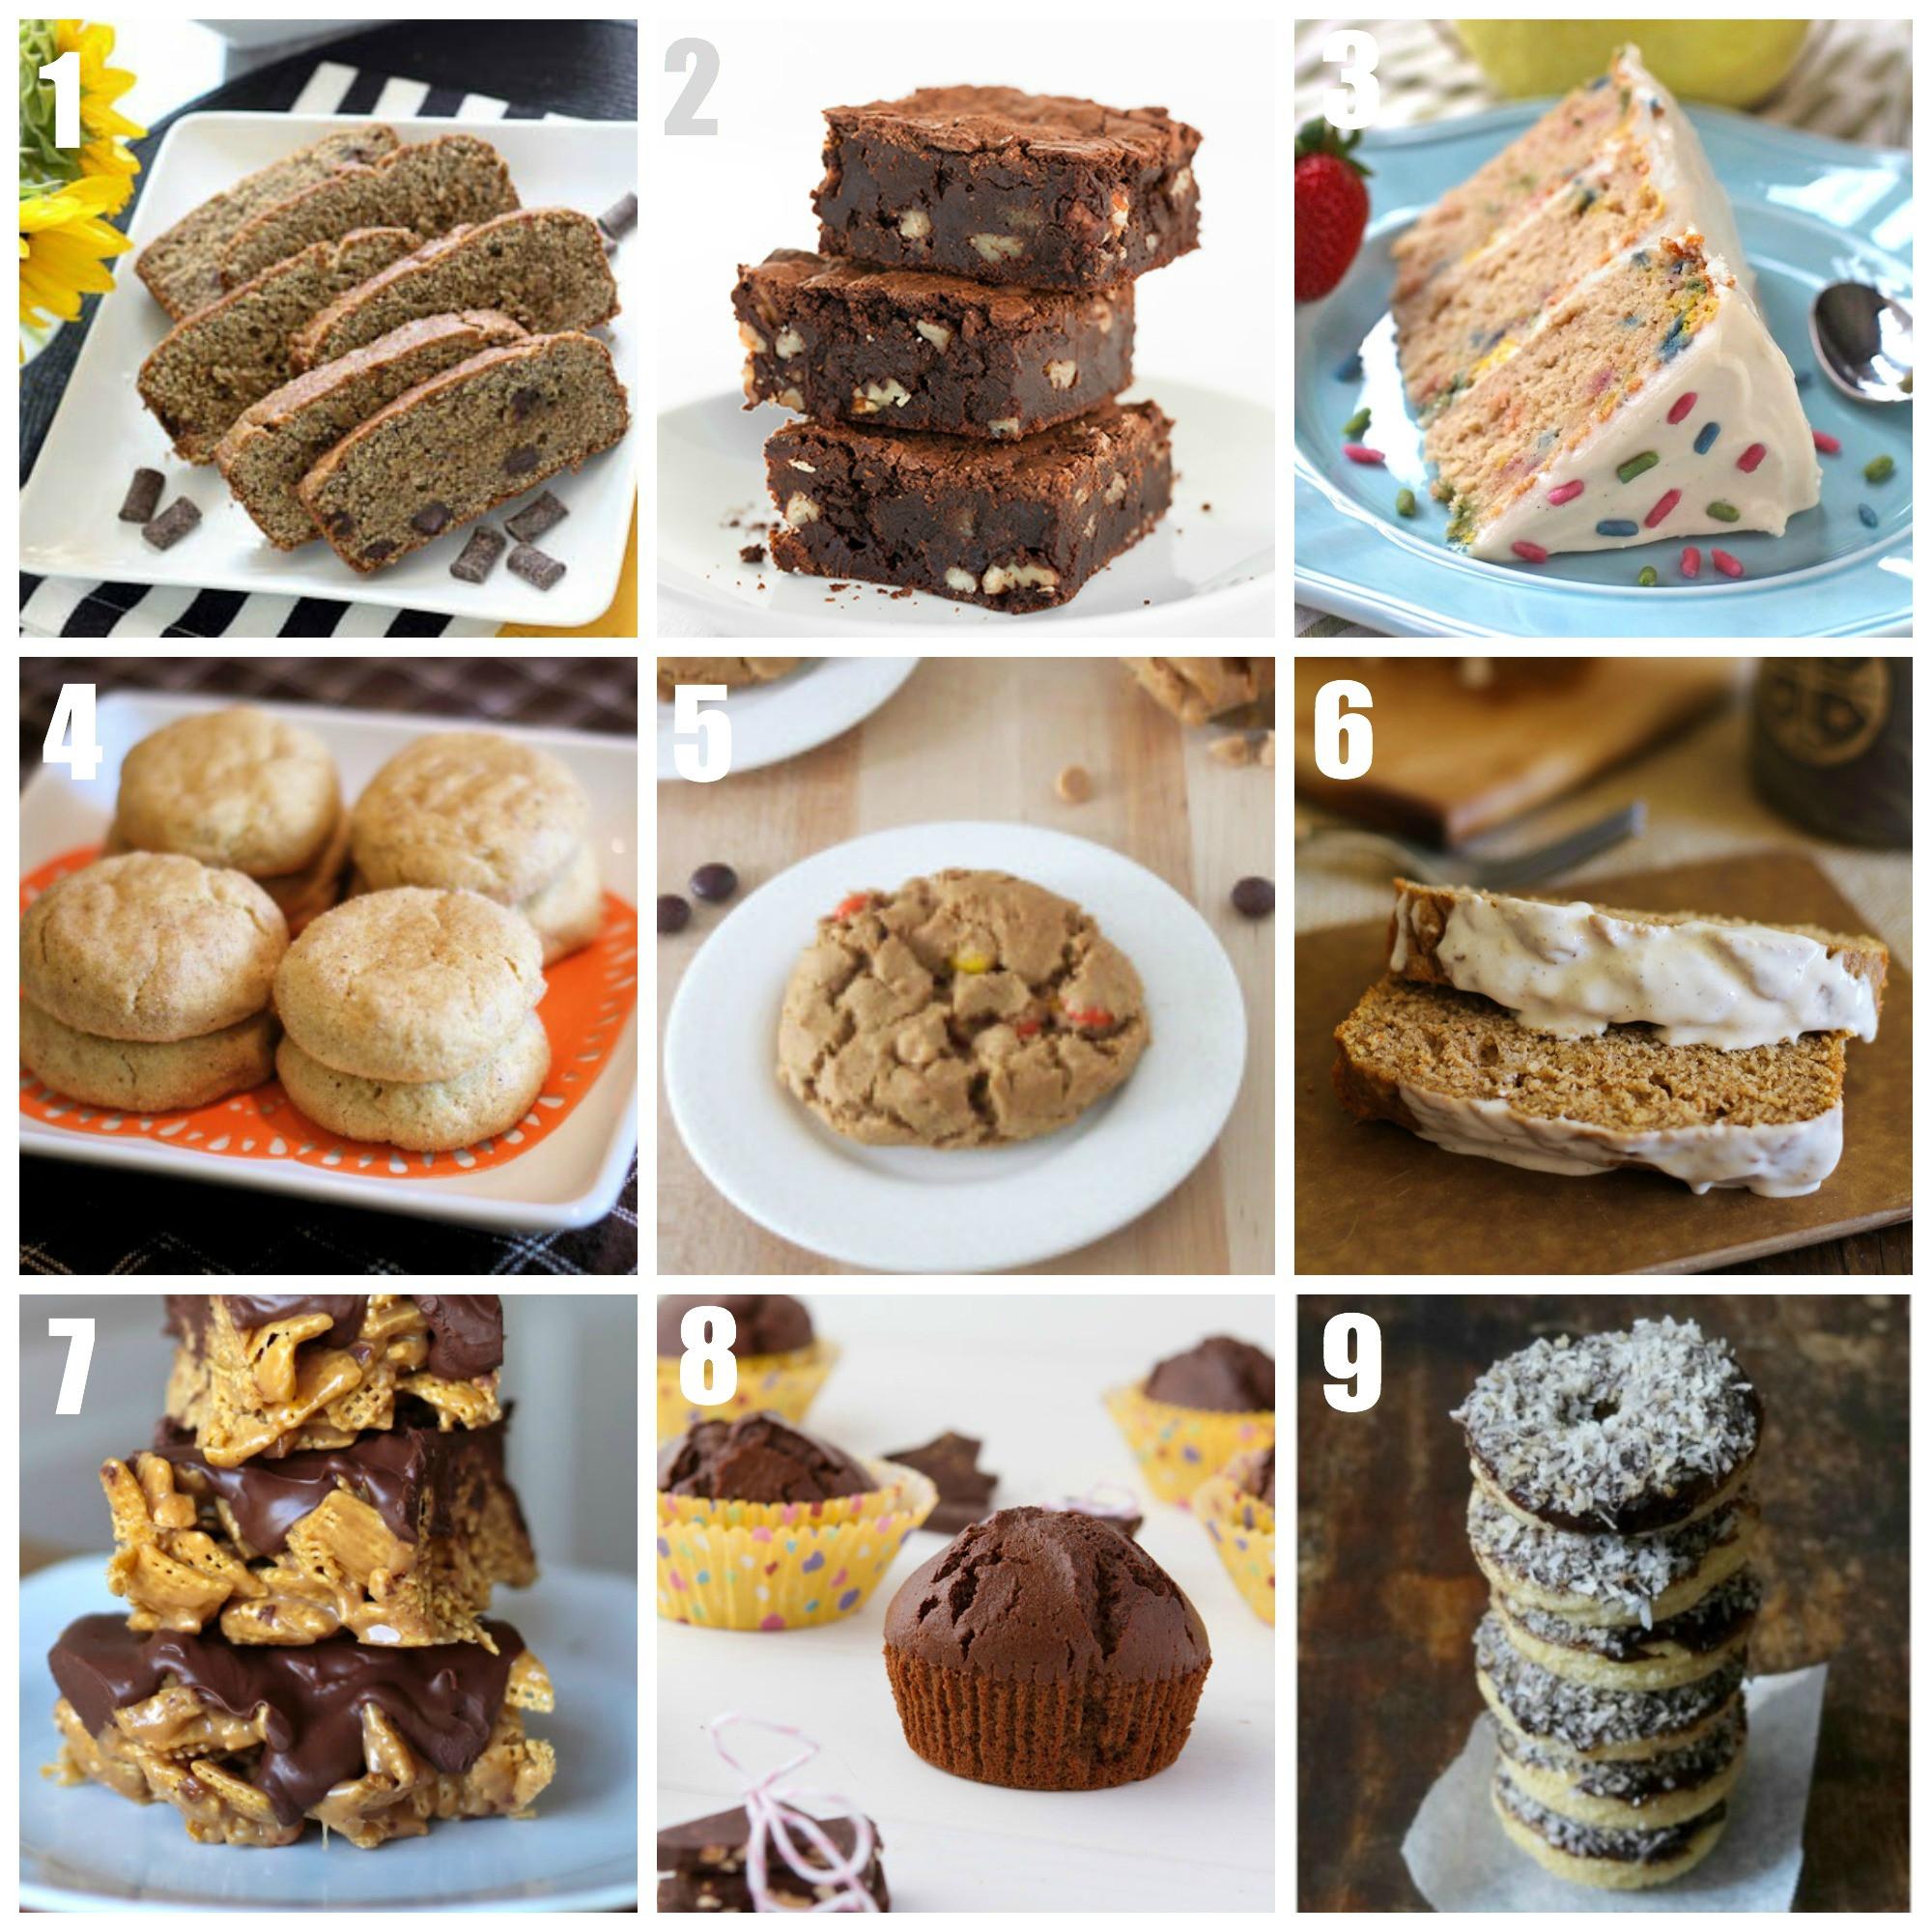 Gluten Free Desserts Recipes  Easy Gluten Free Dessert Recipes